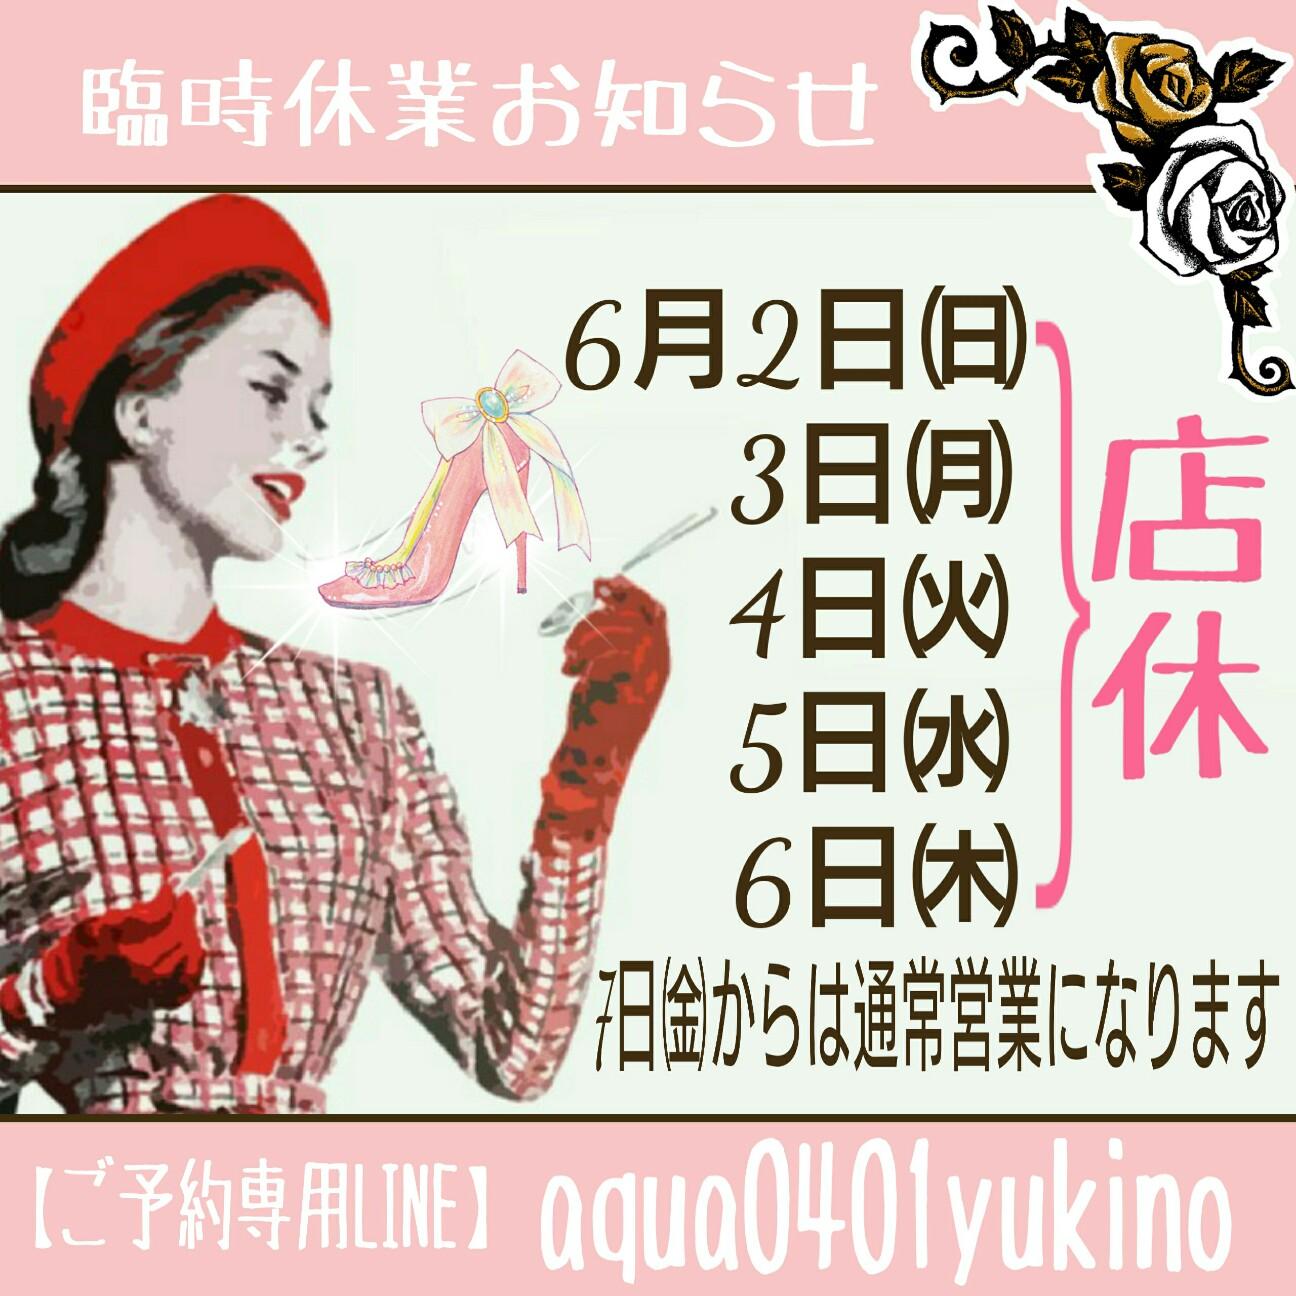 f:id:aquayukino:20190602013721j:image